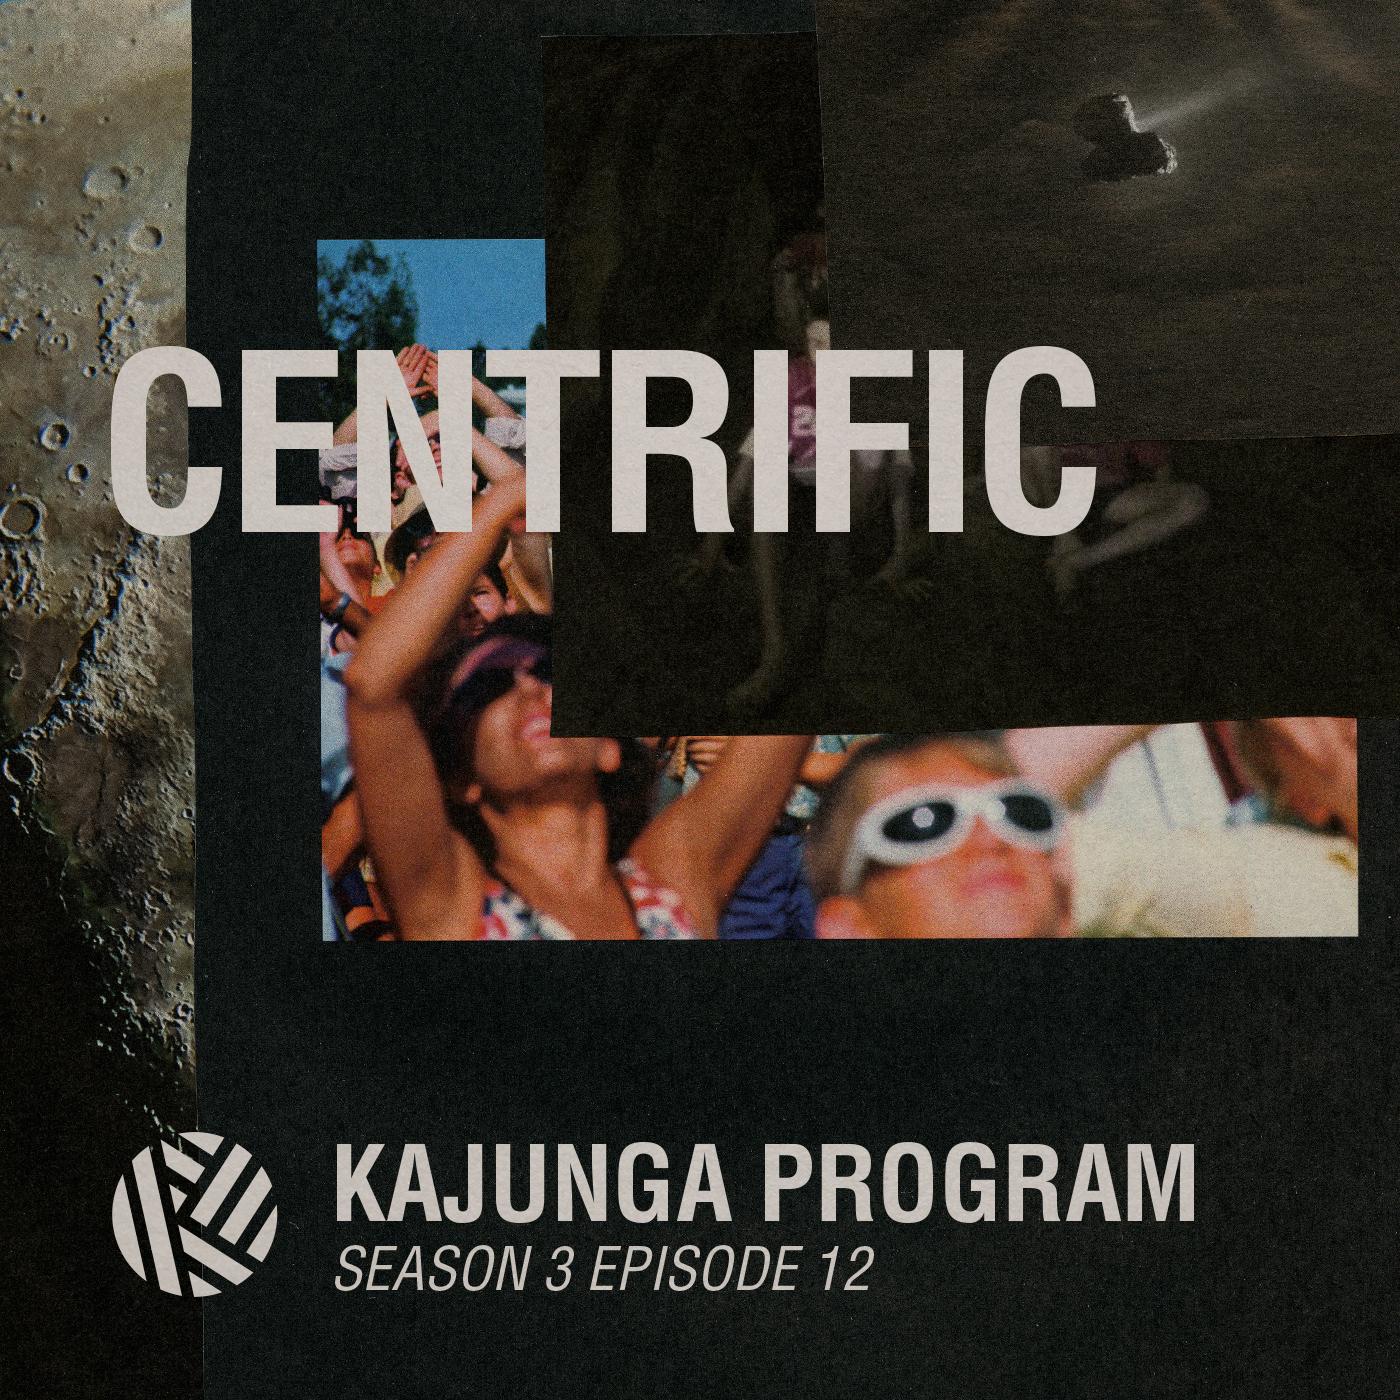 Kajunga_Program_Layout_Centrific (1).jpg